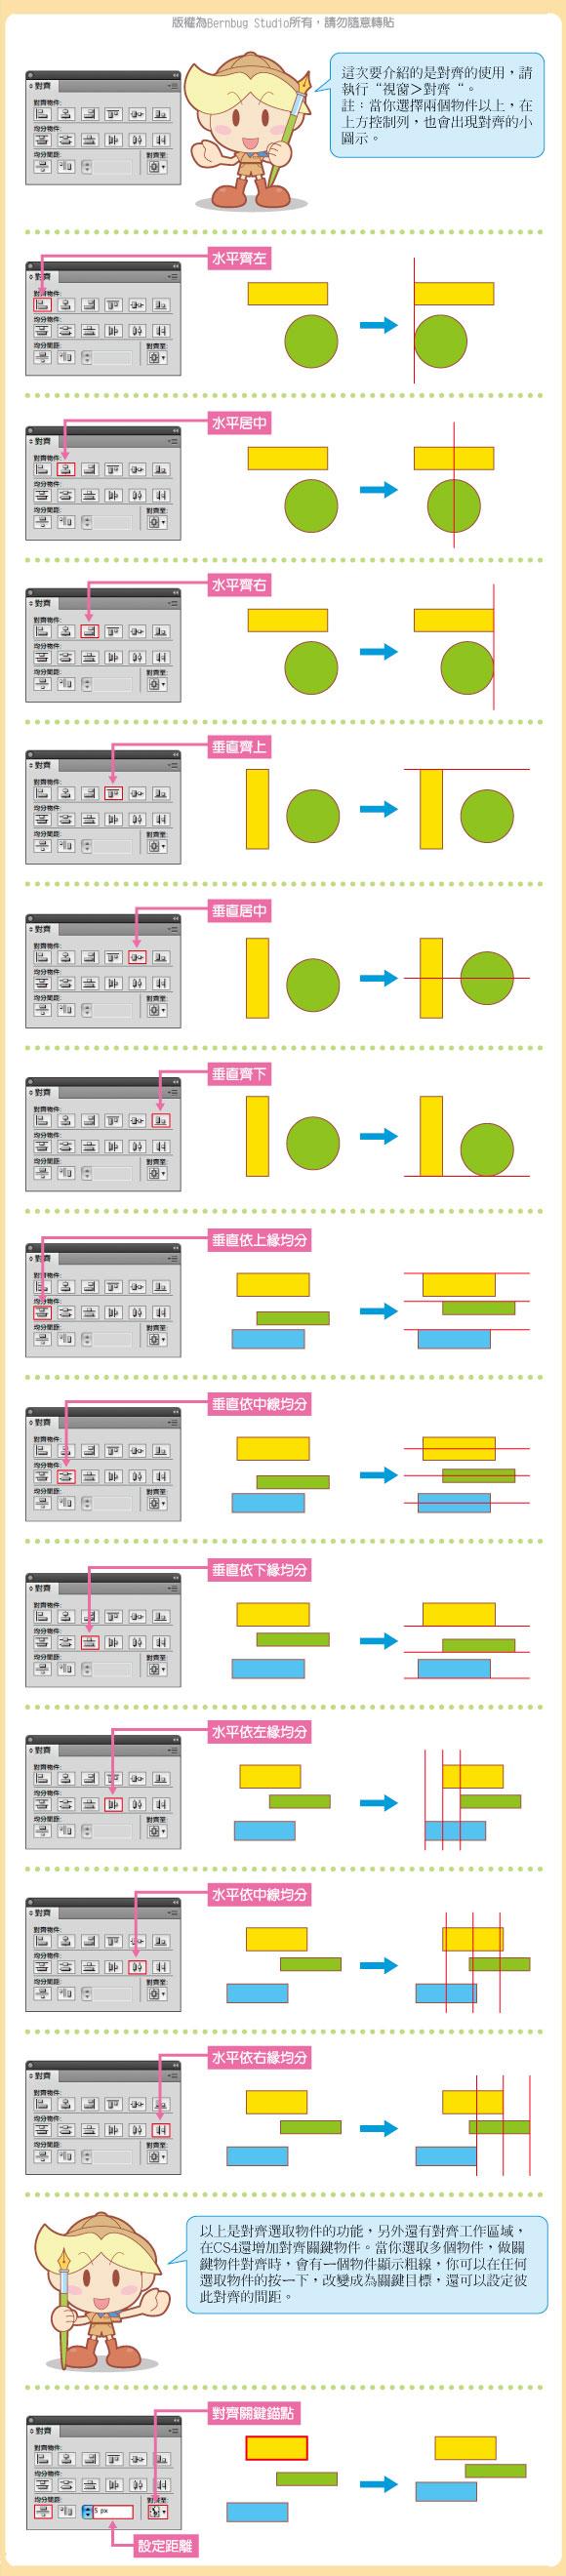 lesson6.jpg